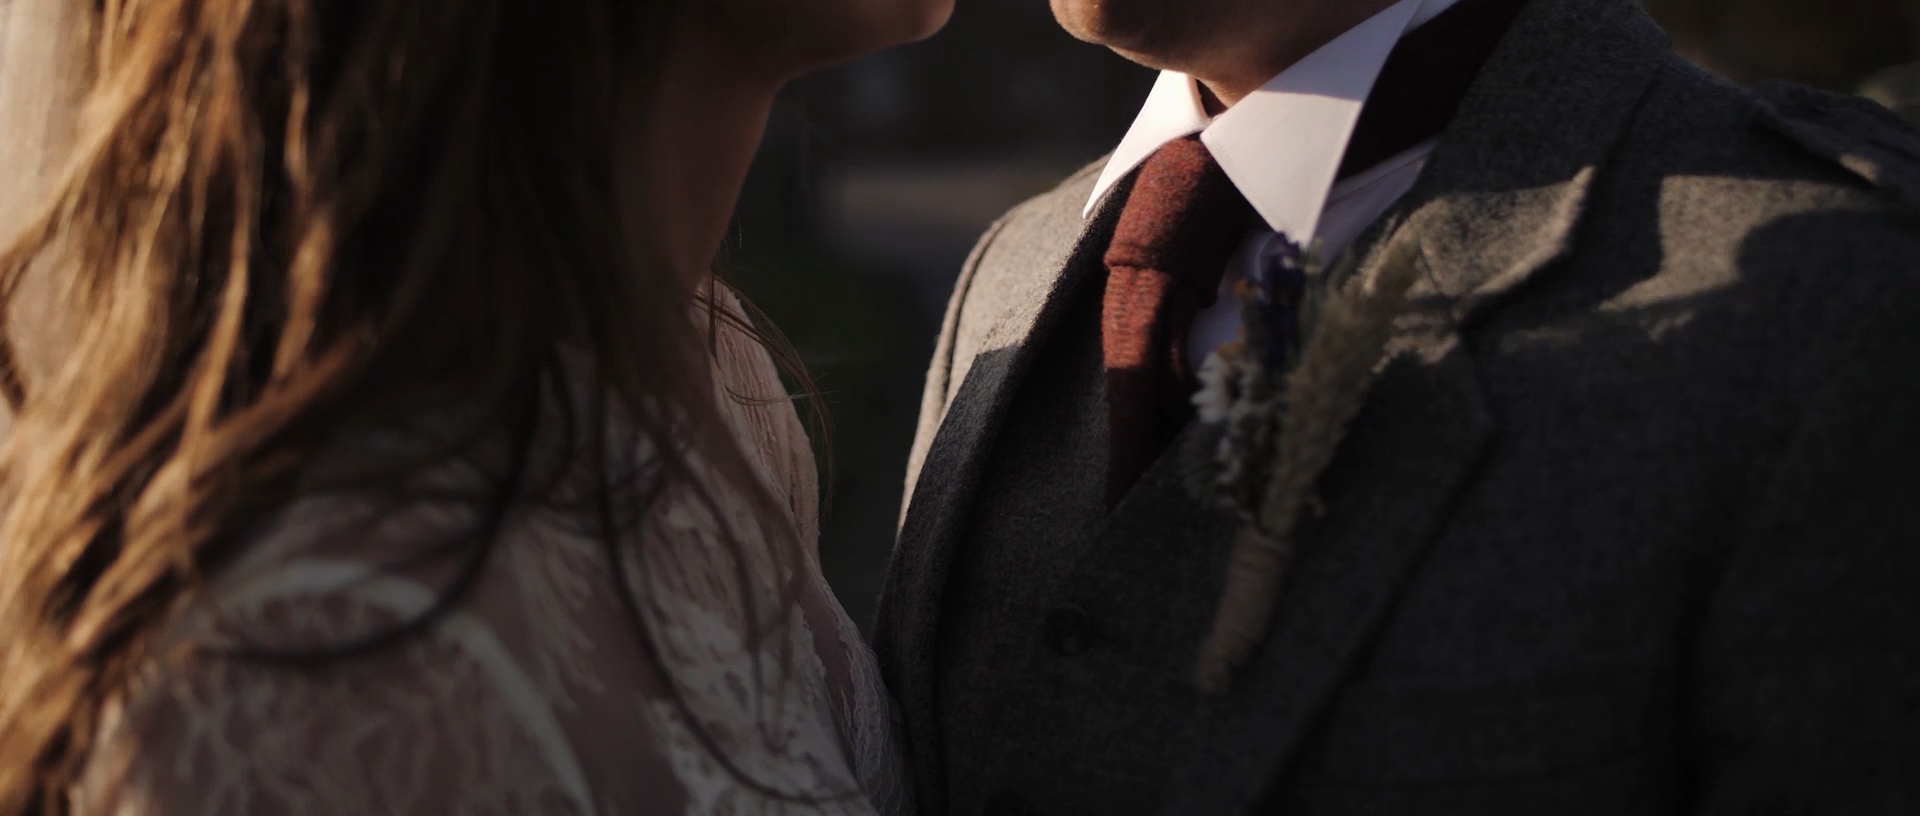 hotel-du-vin-at-one-devonshire-gardens-wedding-videographer_LL_04.jpg